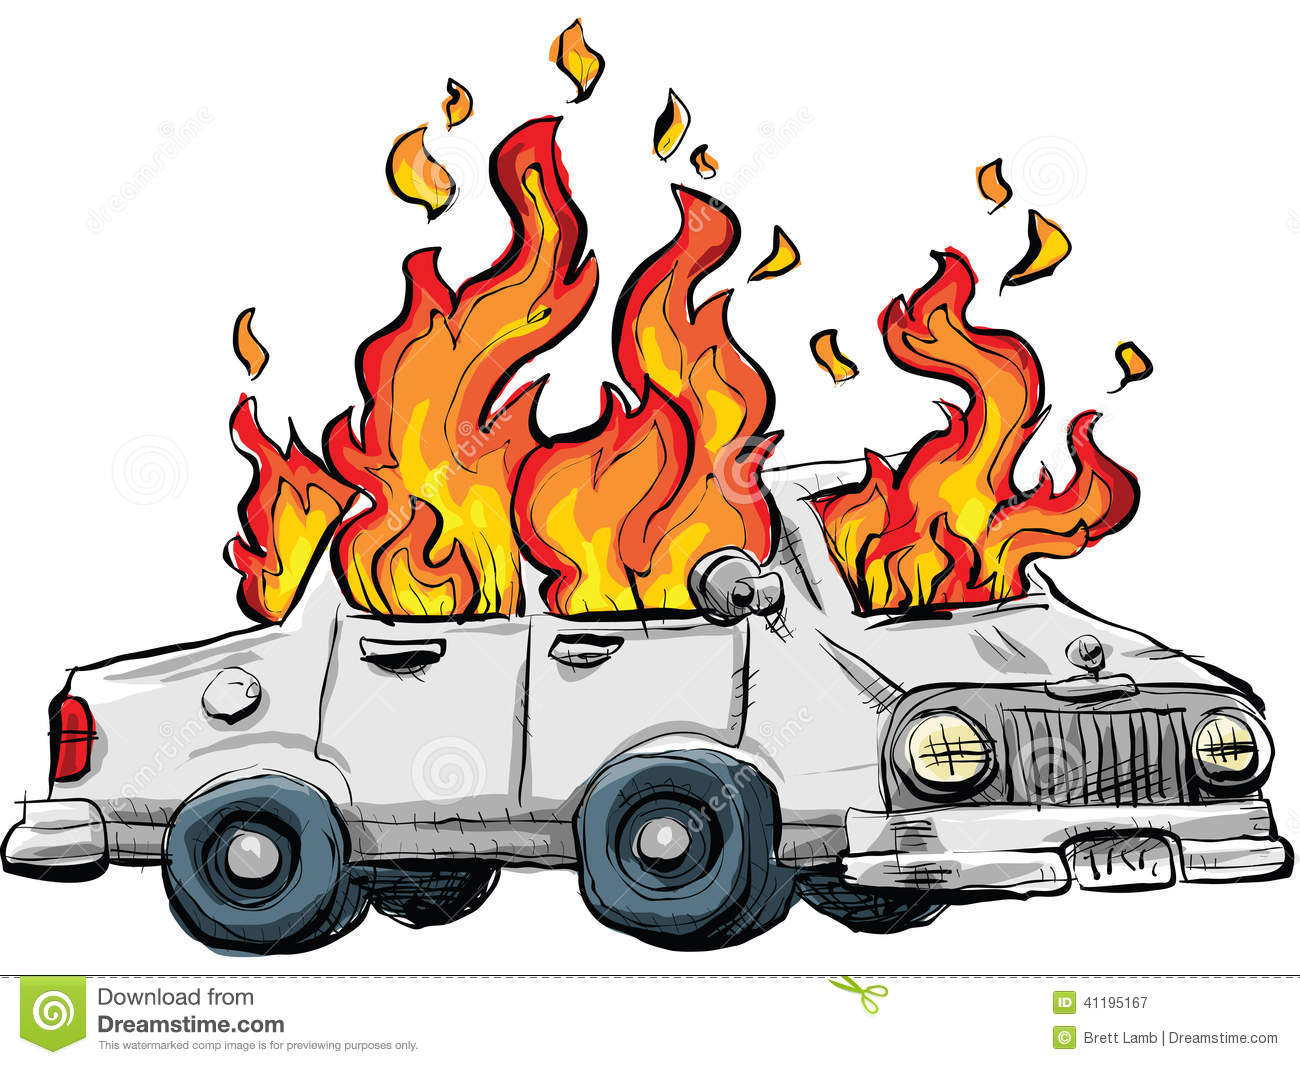 Car fire clipart.